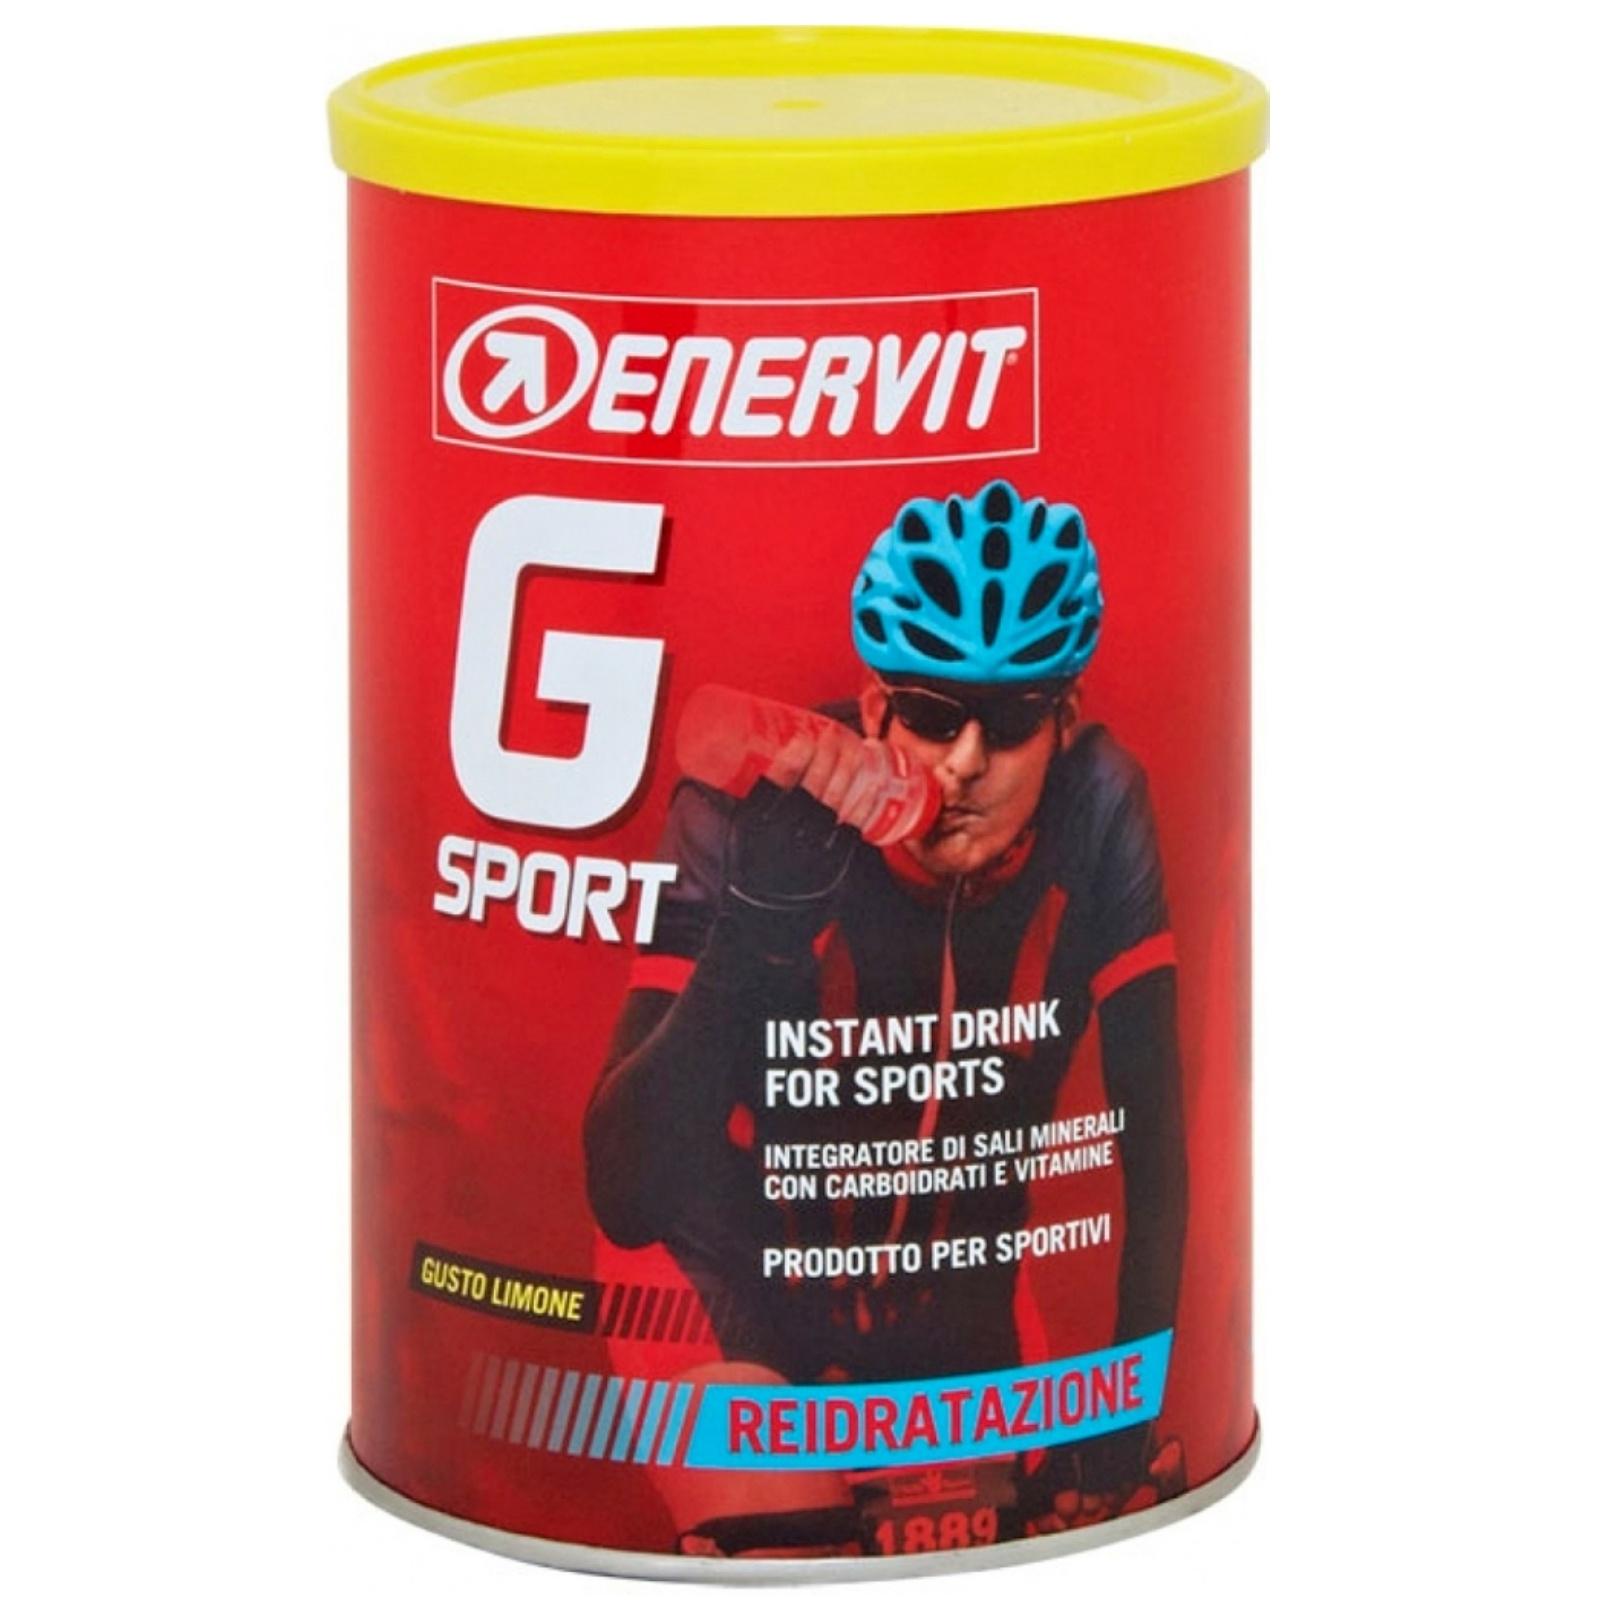 Energetický nápoj ENERVIT G Sport v tubě - citron